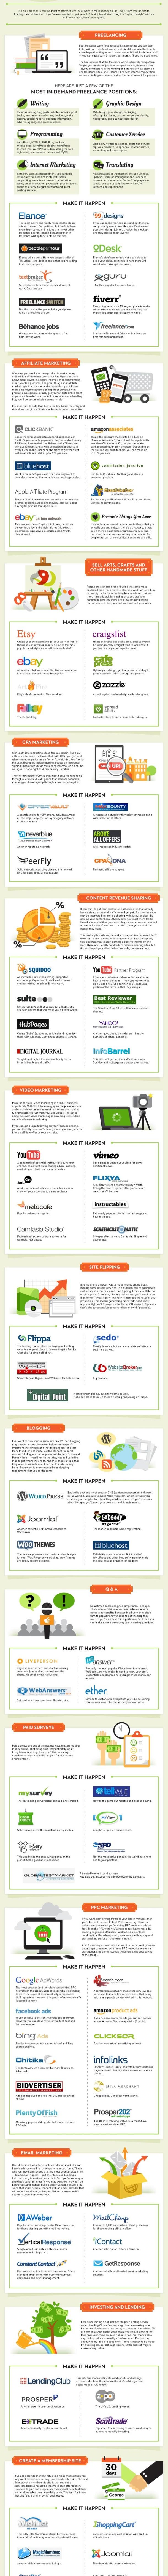 make_money_online_infographic